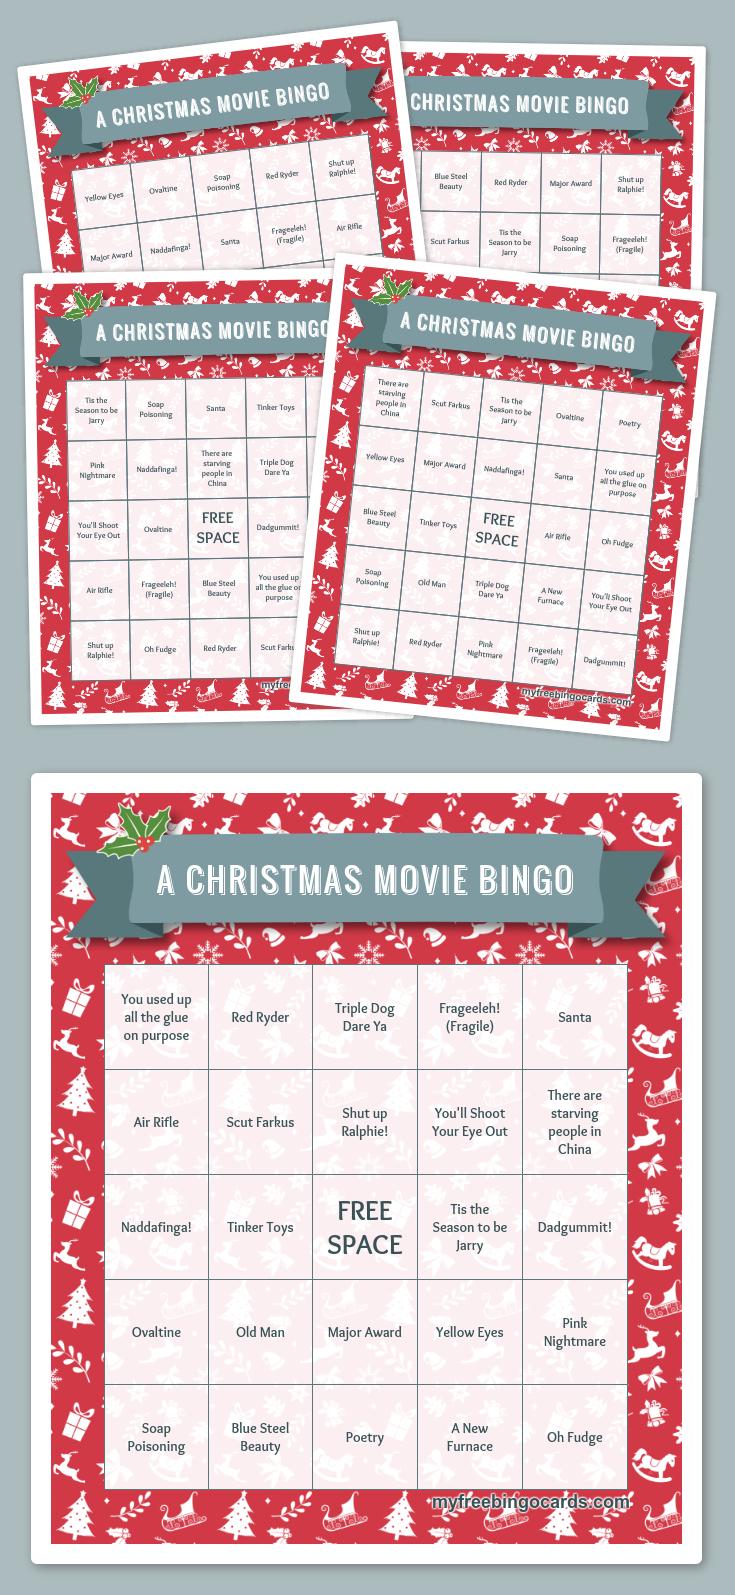 A Christmas Movie Bingo | Printable Christmas Bingo Cards